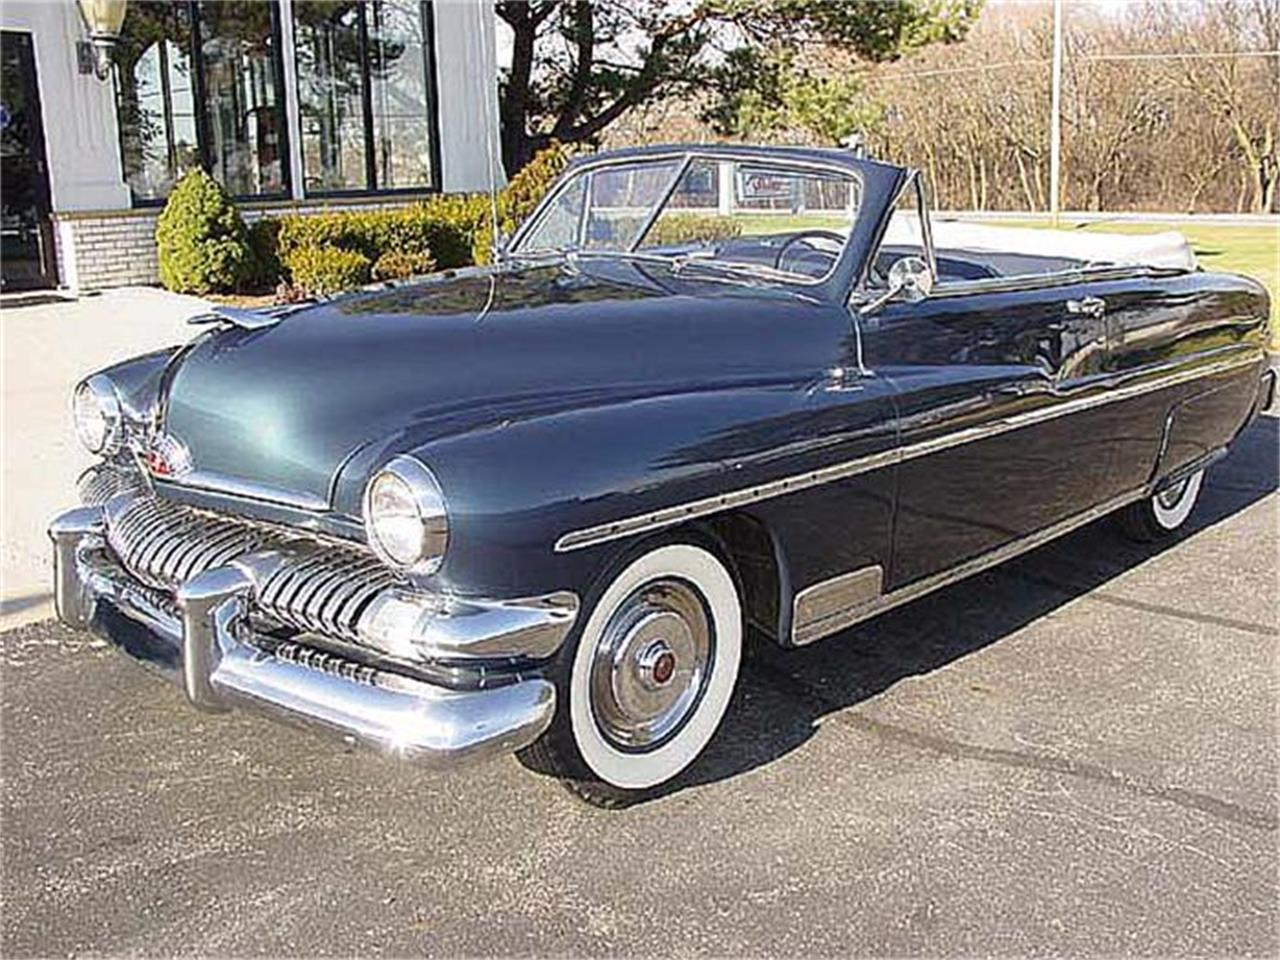 Fred Rowe's 1951 Mercury - Kustomrama